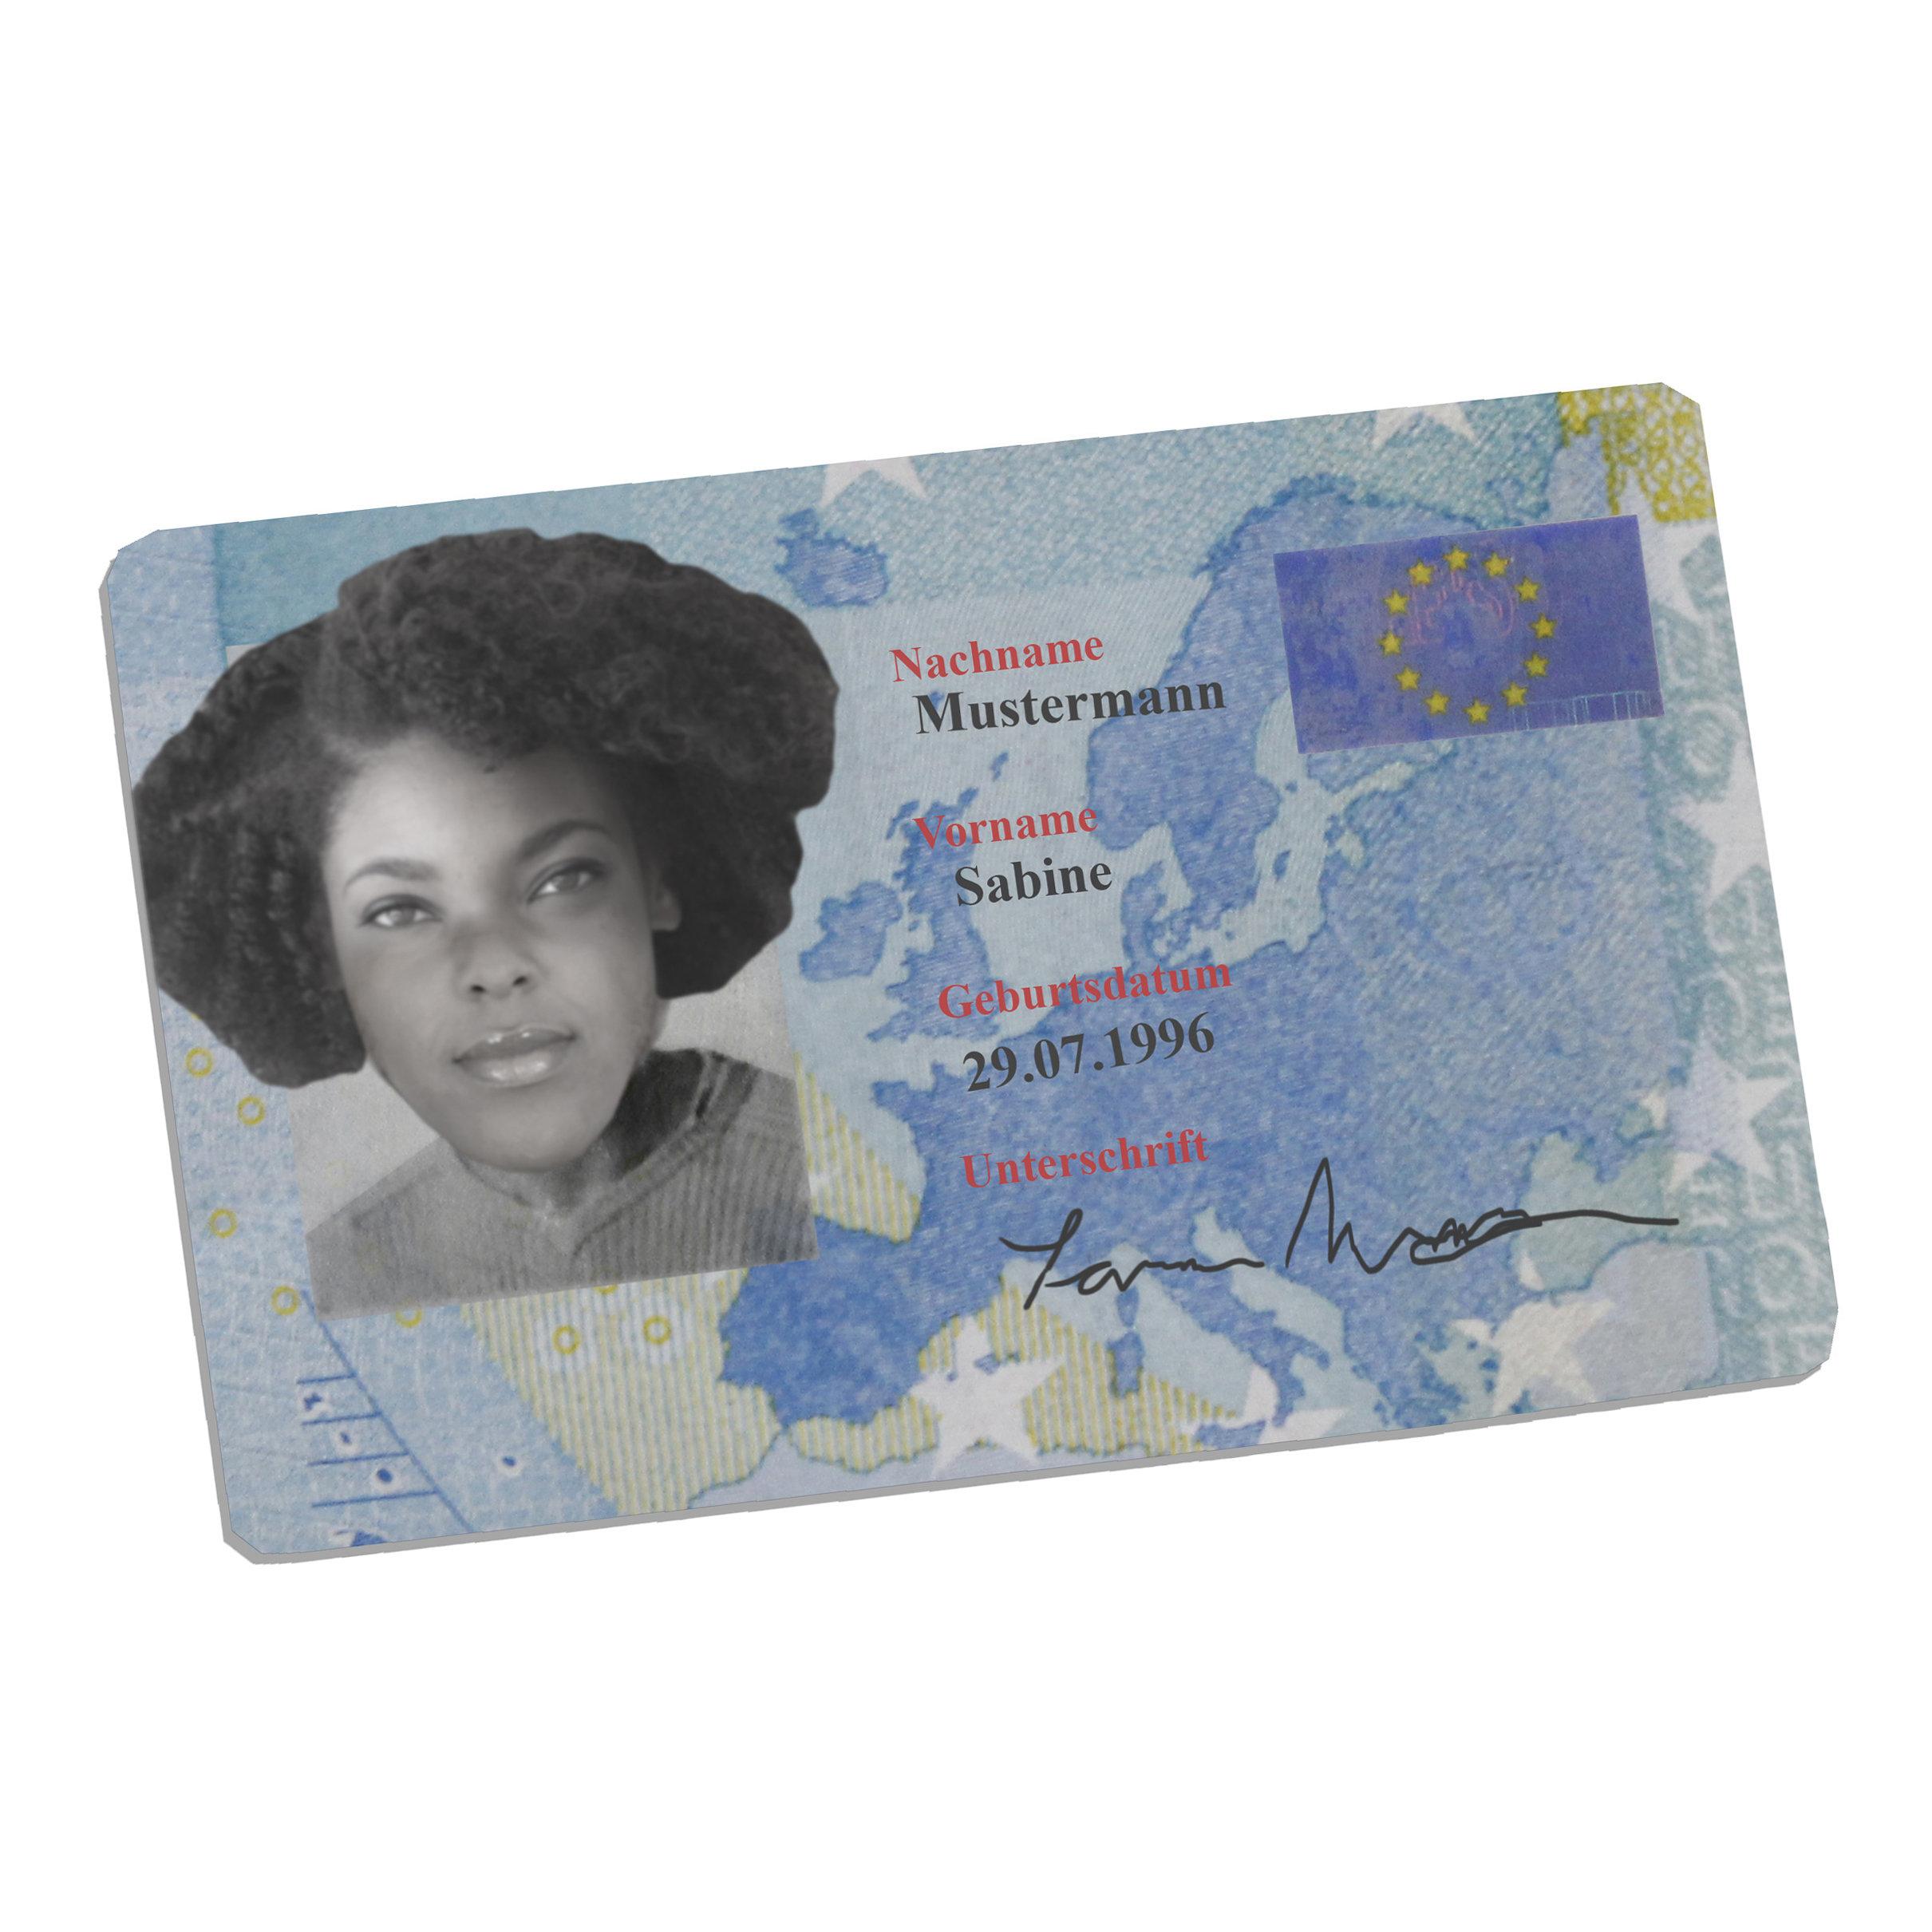 EU Pass